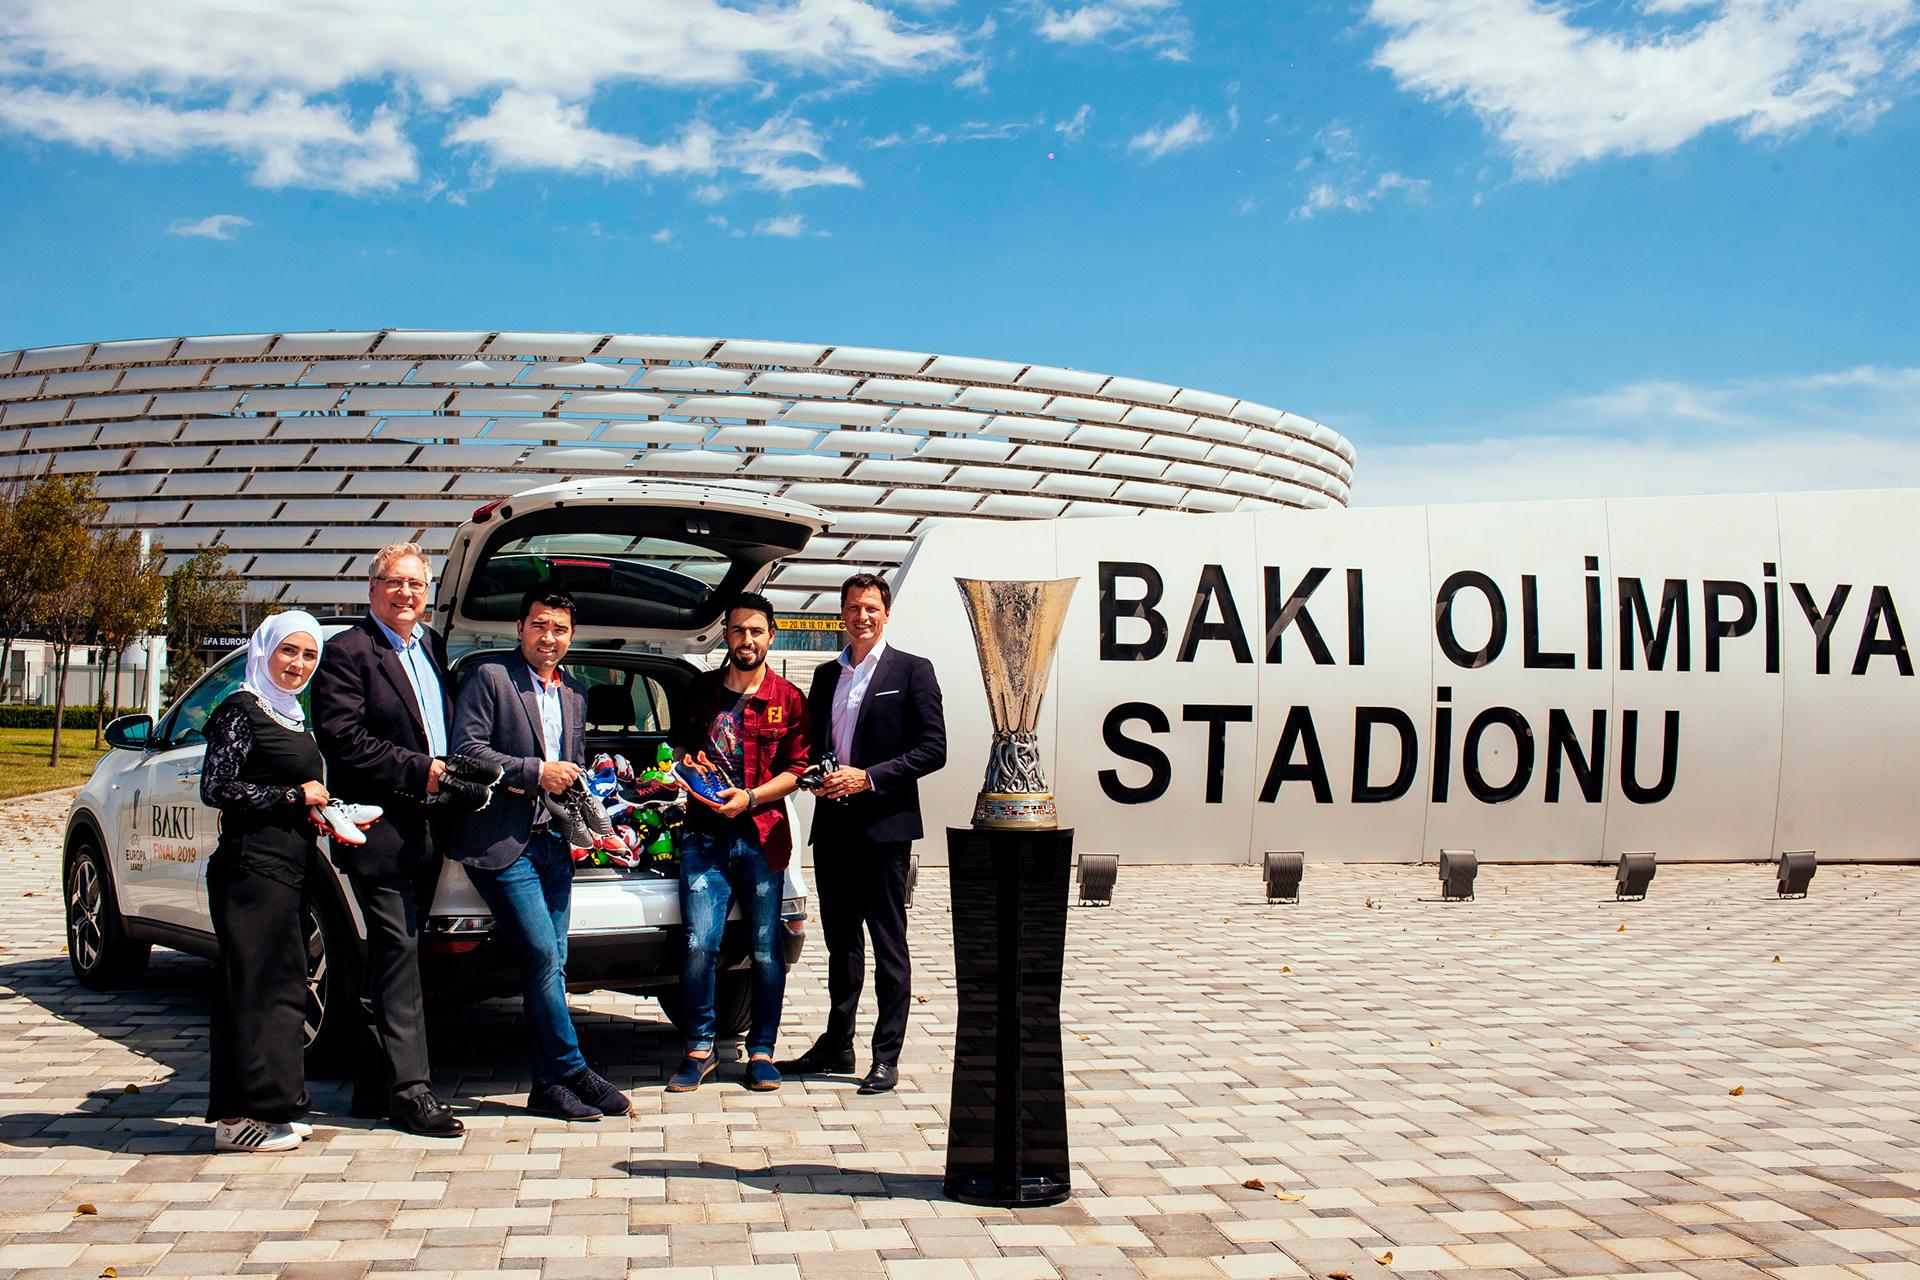 kia-motors-organizeaza-o-campanie-de-donatii-prin-fundatia-uefa-pentru-a-oferi-ghete-de-fotbal-tinerilor-refugiati